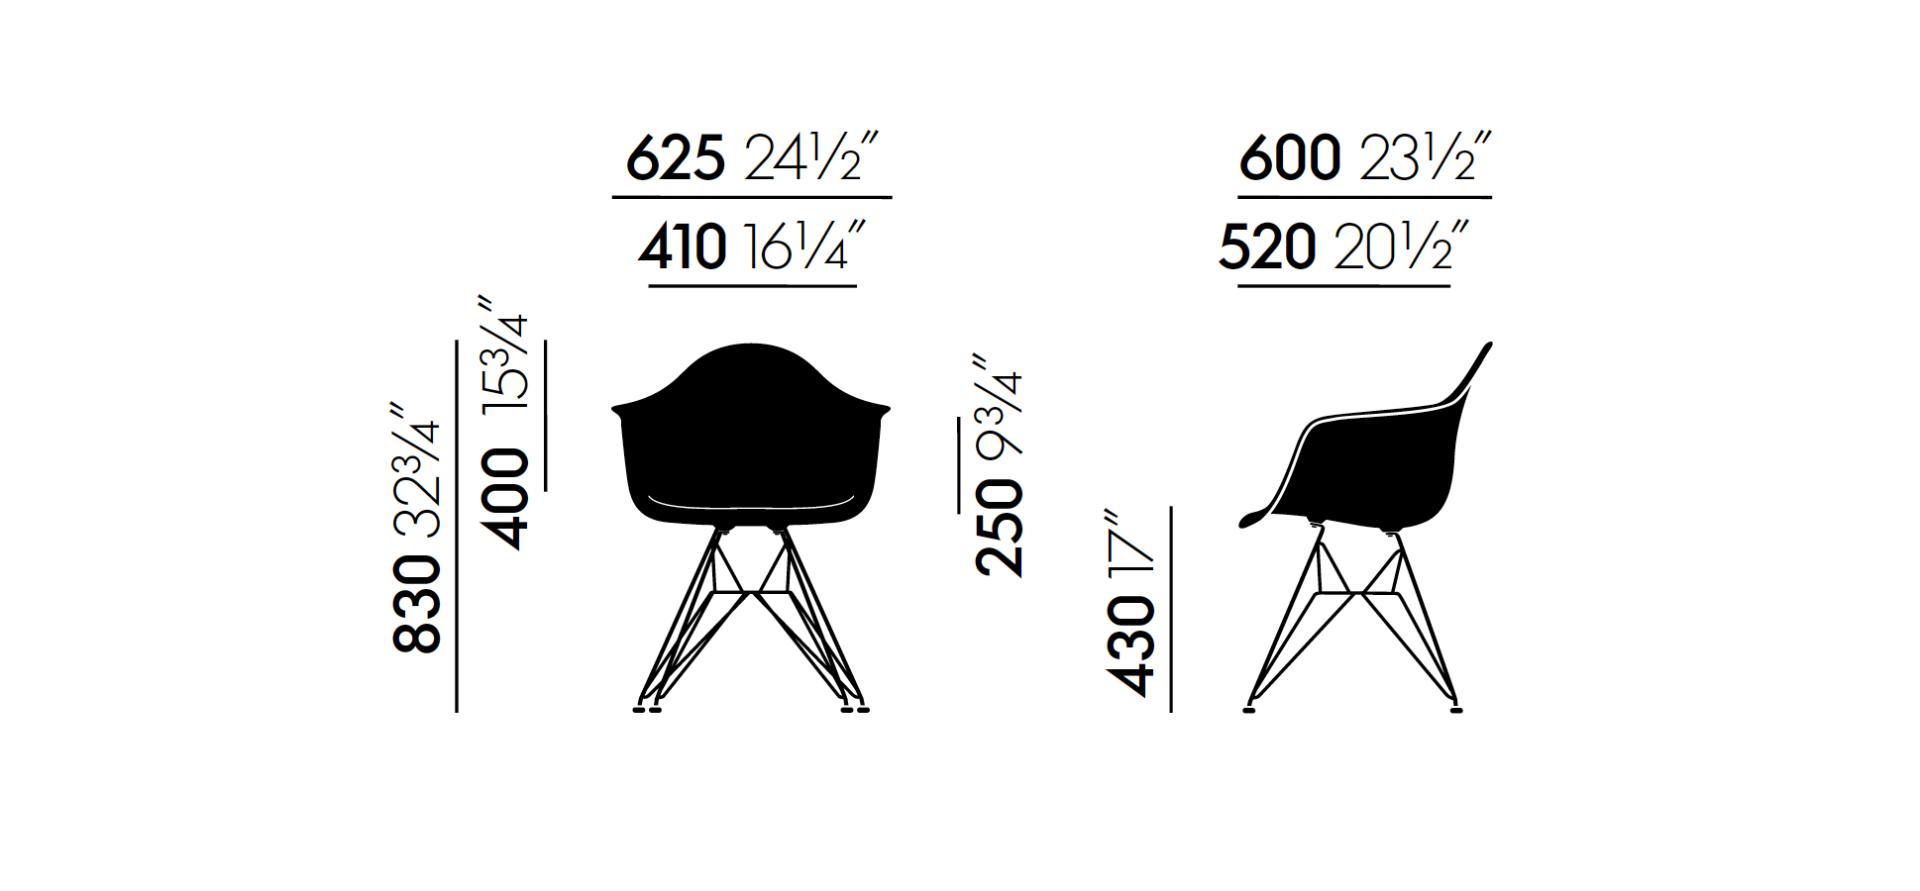 daw stuhl iconic designs eames style grauer daw stil stuhl with daw stuhl finest eames plastic. Black Bedroom Furniture Sets. Home Design Ideas